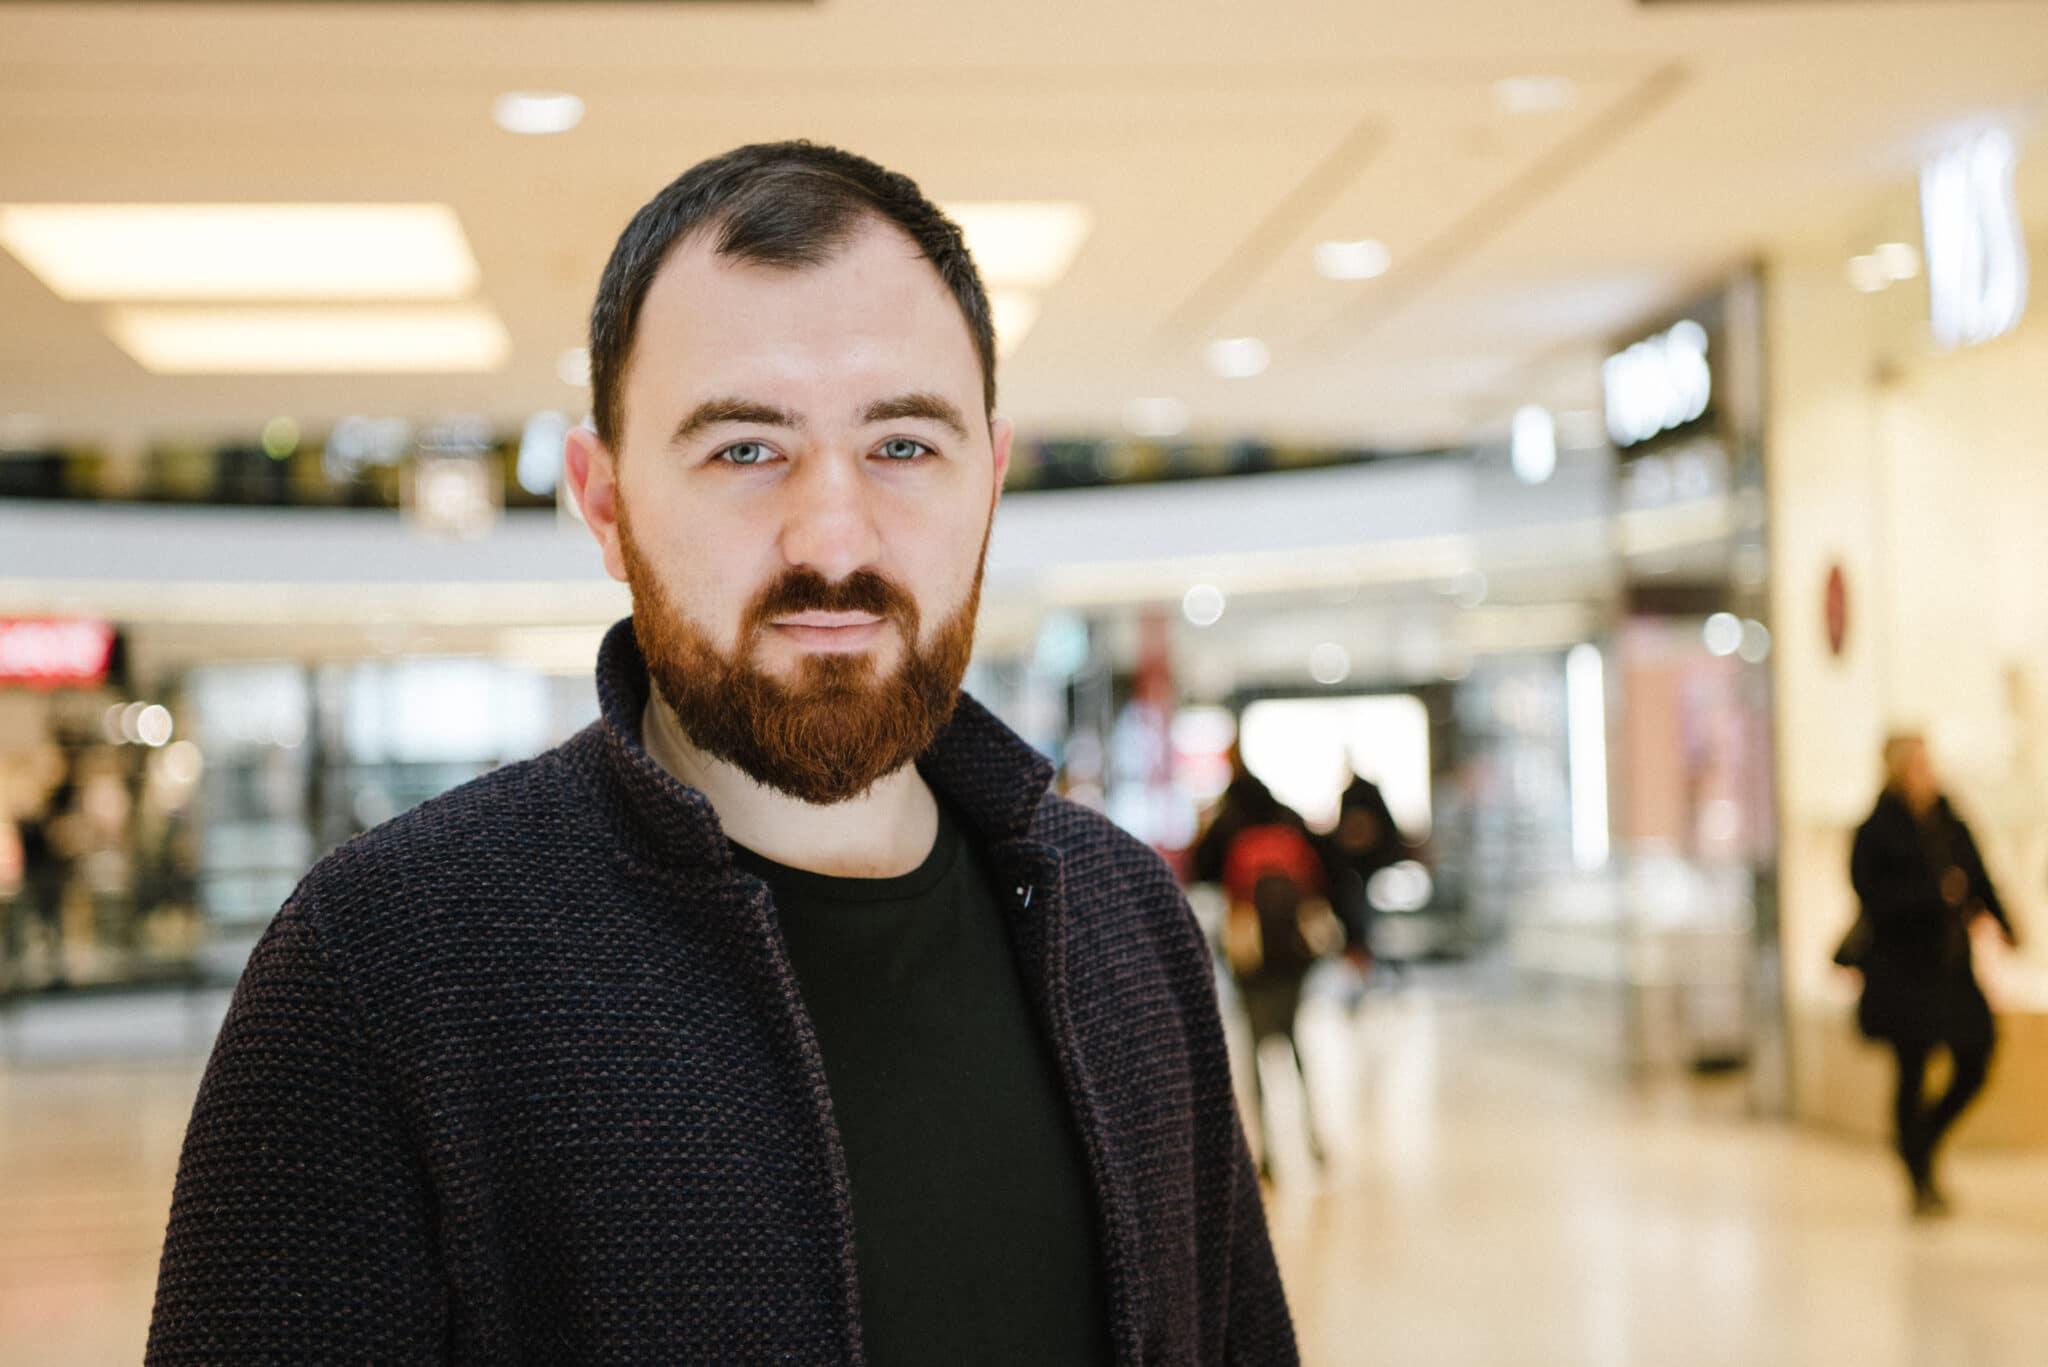 Artsiom Markevich Vocalls scaled